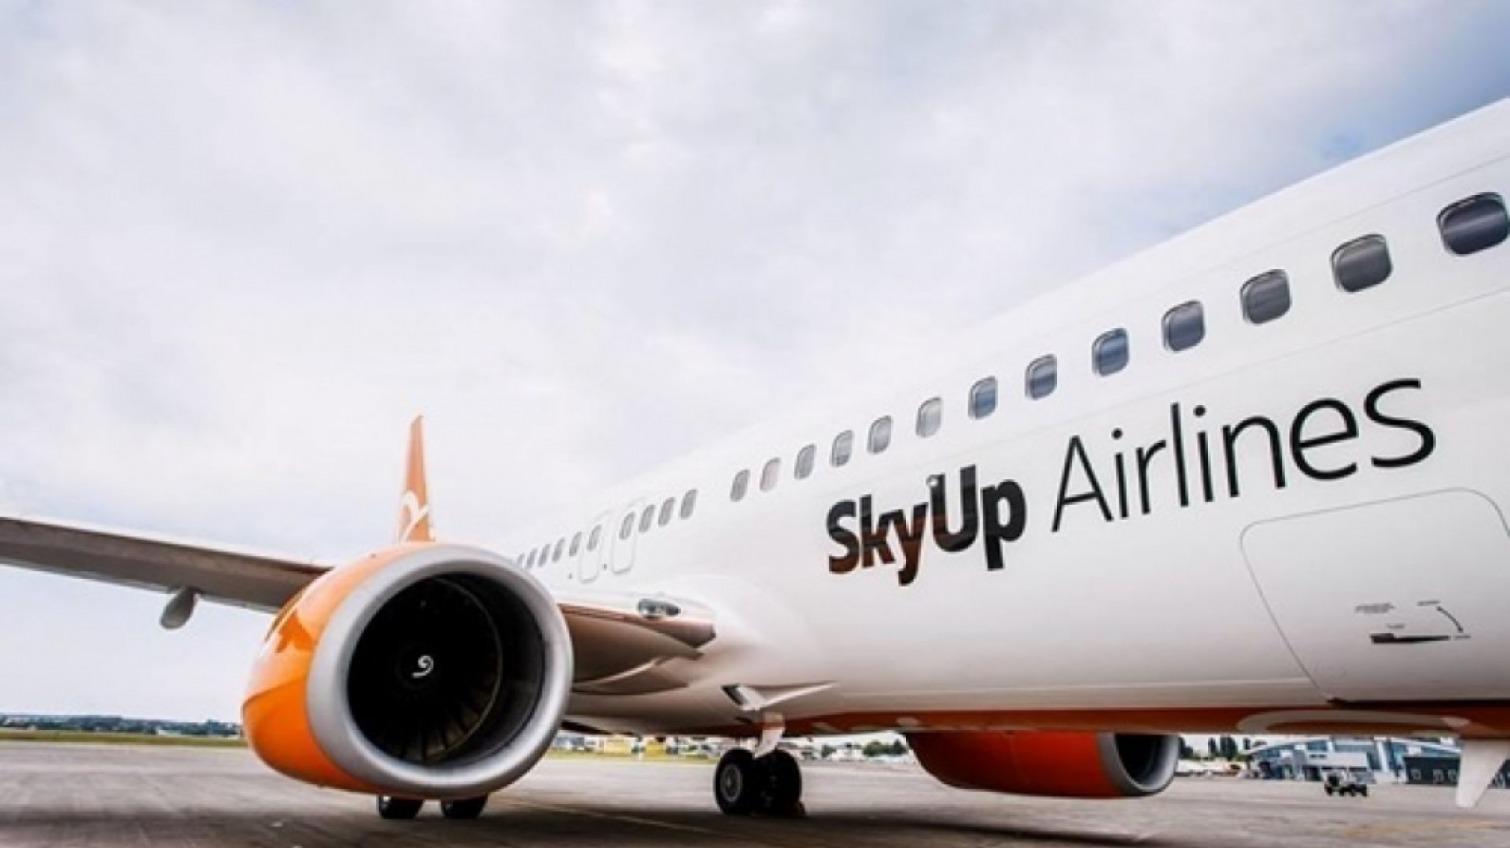 Авиарейсы Одесса – Киев по 600 грн за билет возобновят в мае «фото»